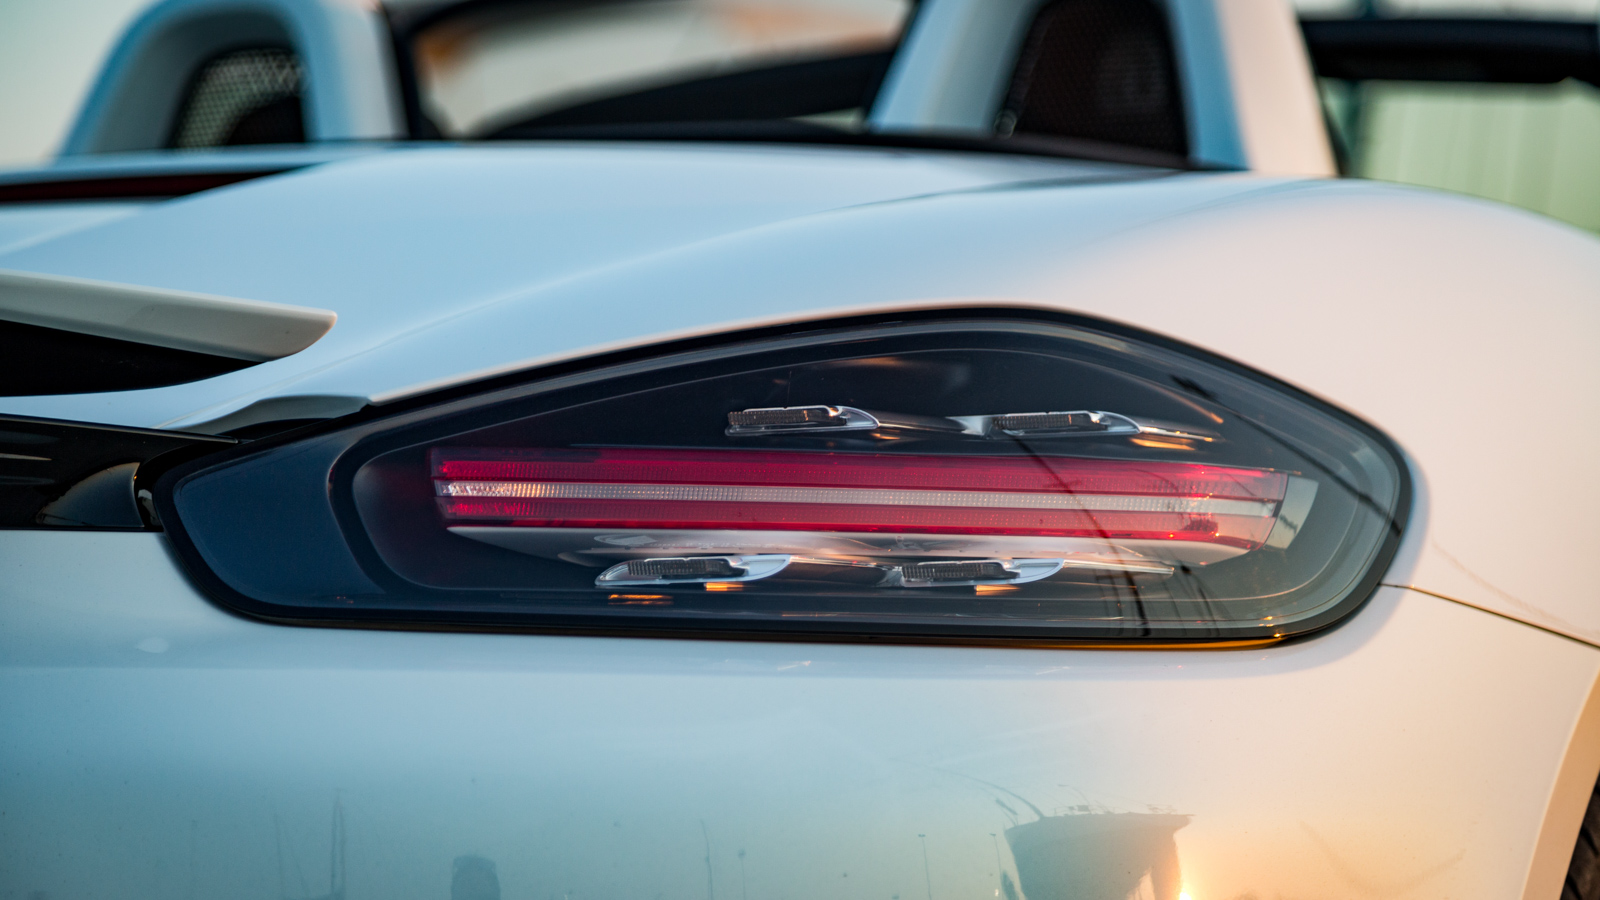 Test_Drive_Porsche_718_Boxster_19